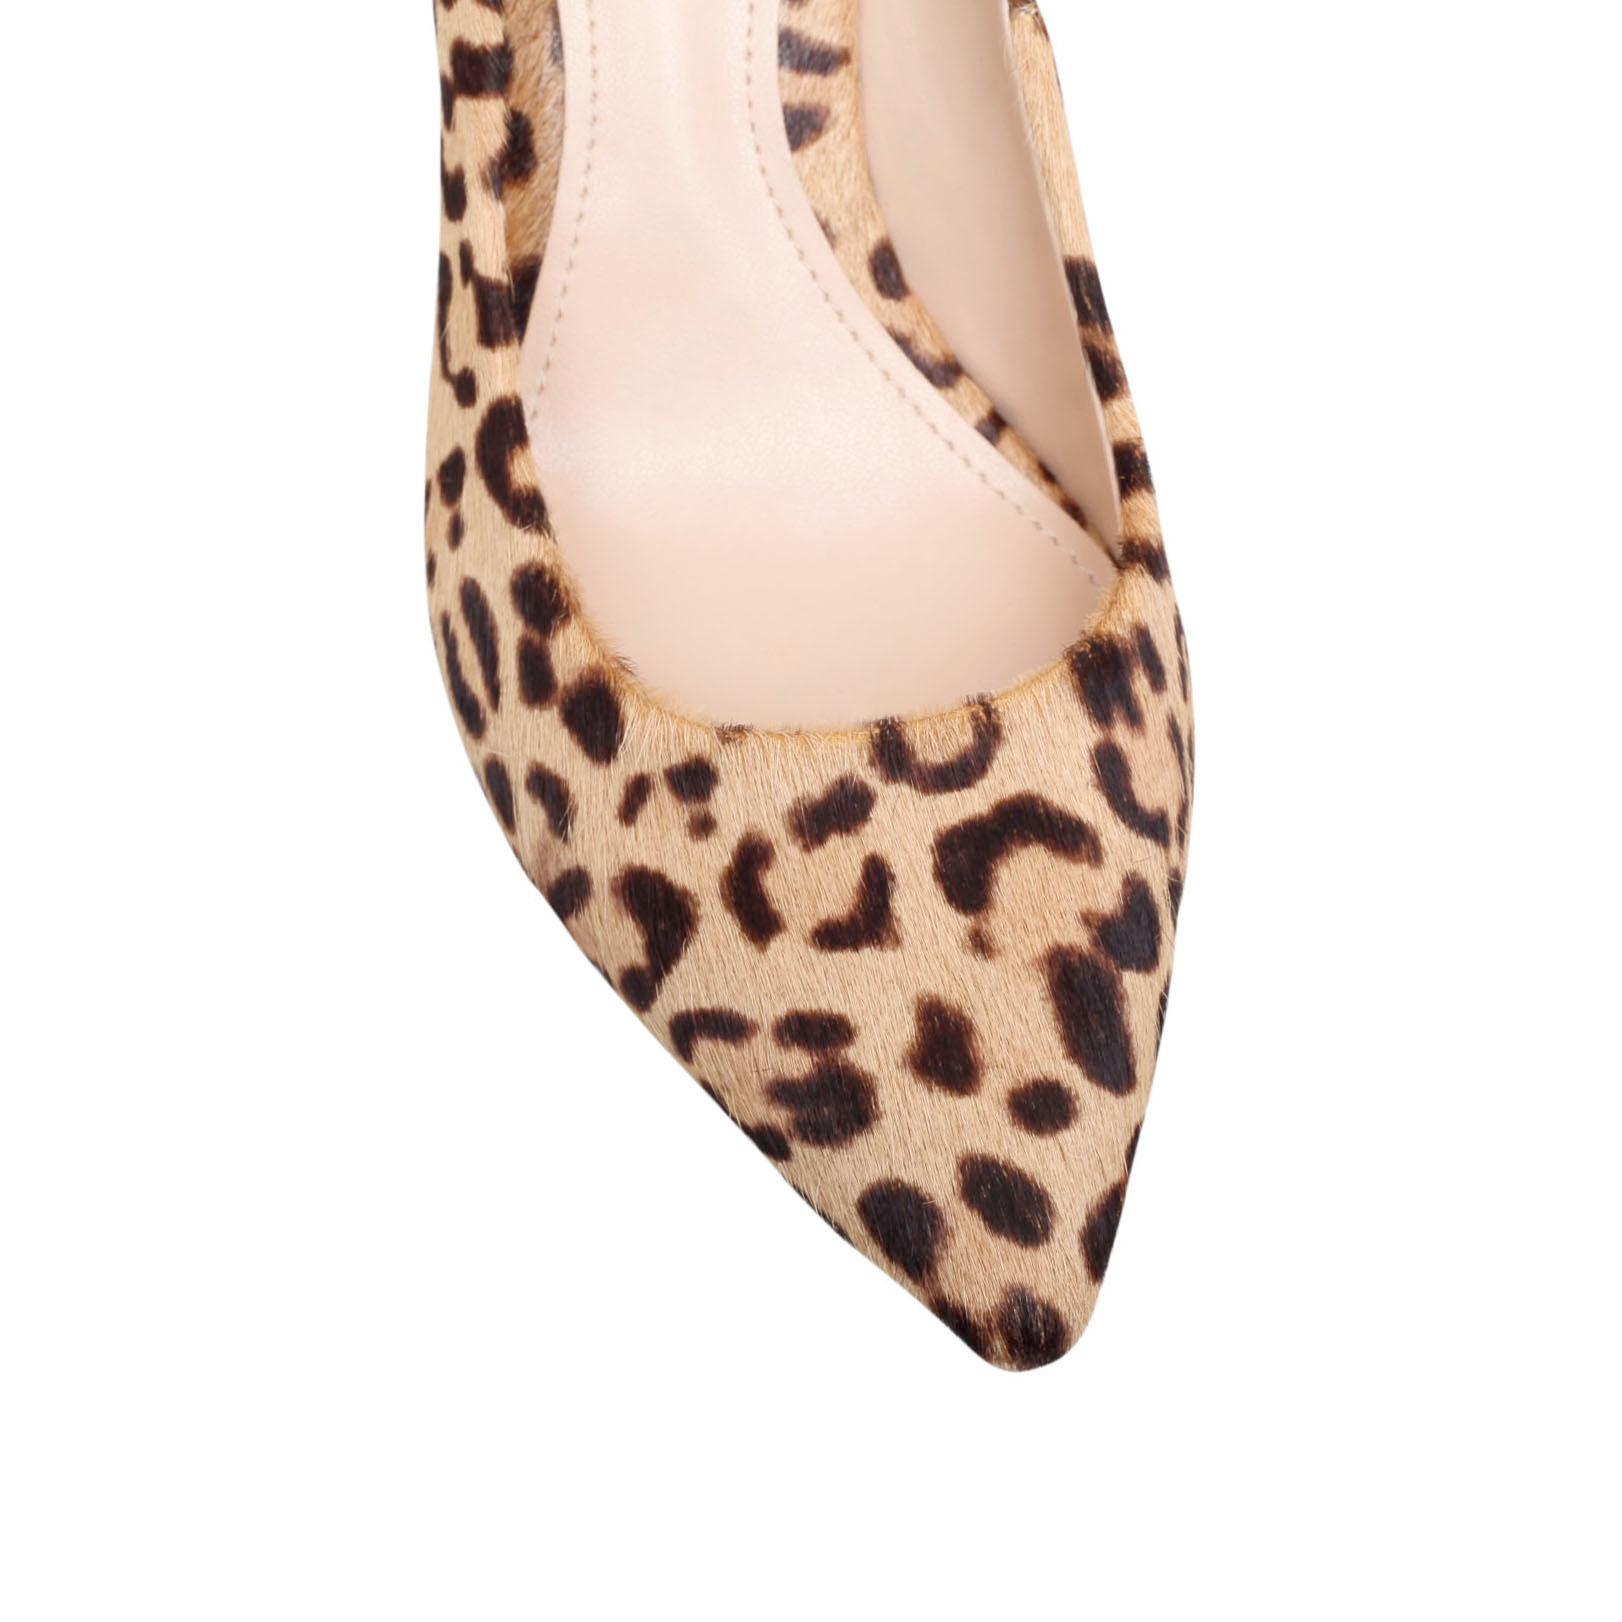 Leopard Print Court Shoes Mid Heel Size